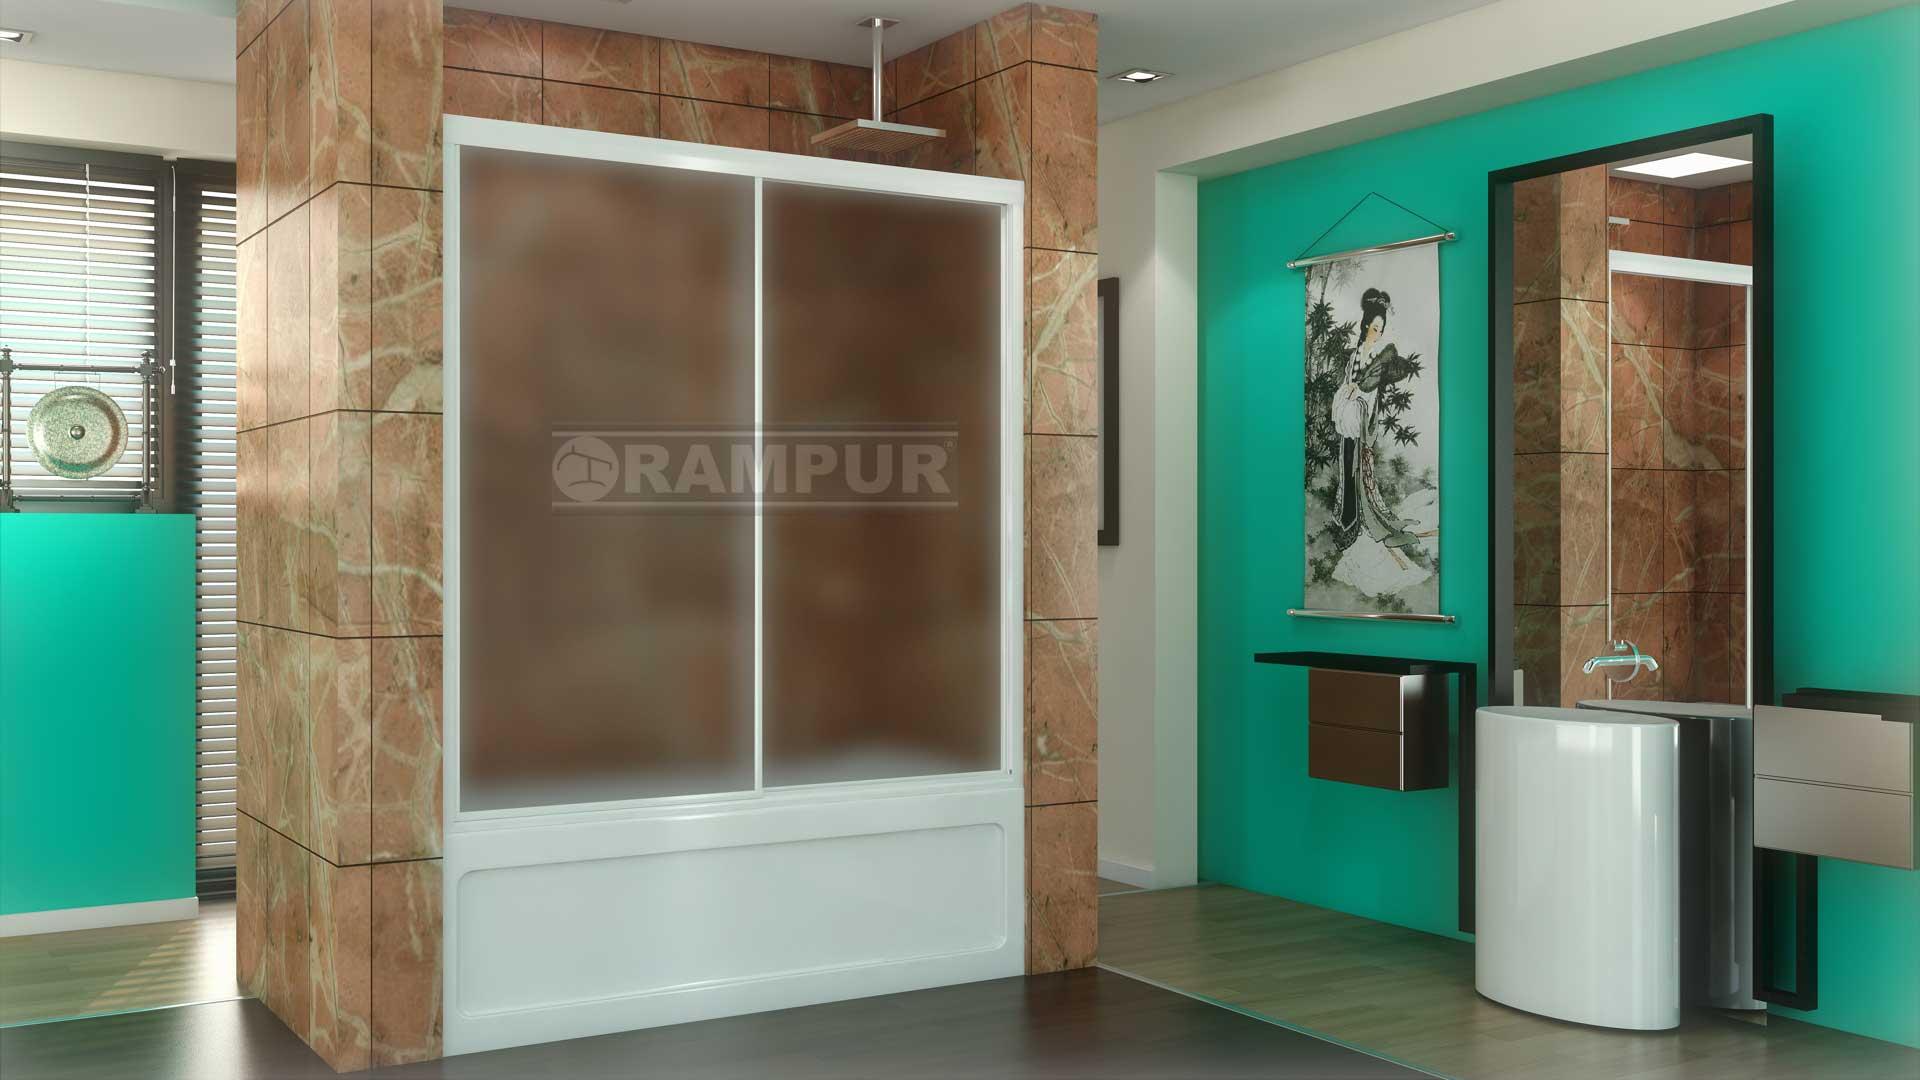 Mamparas Para Baño Rampur:Mampara Para Baño Con 2 Hojas – Acrílico – Aconcagua Premium